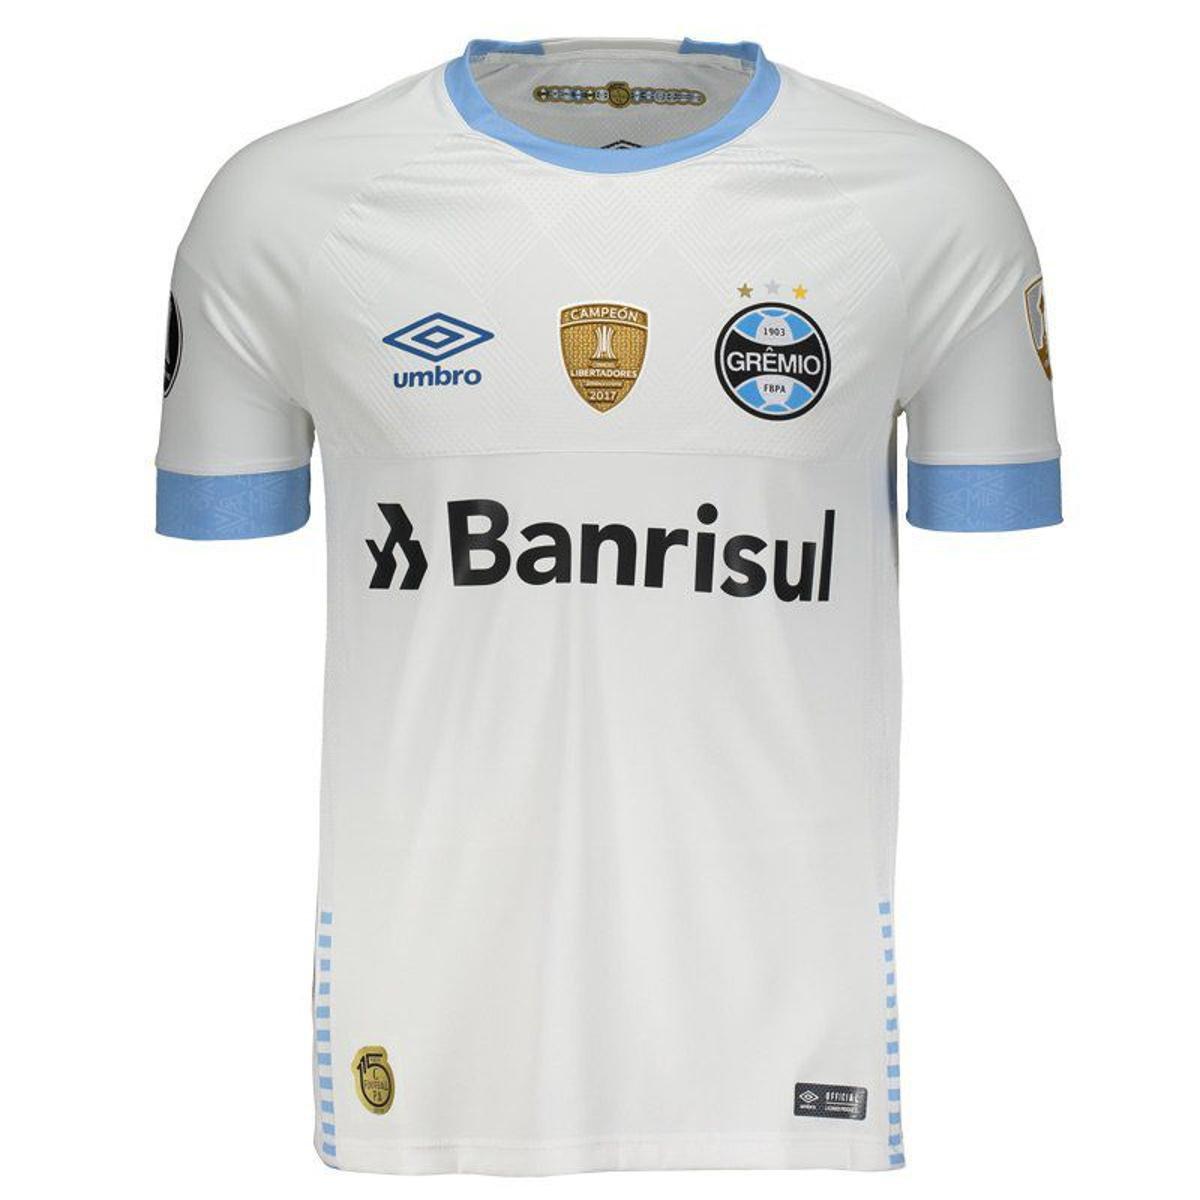 37bd3fb0d8c35 Camisa Umbro Grêmio II 2018 N° 10 Libertadores Jogador Masculina - Branco -  Compre Agora